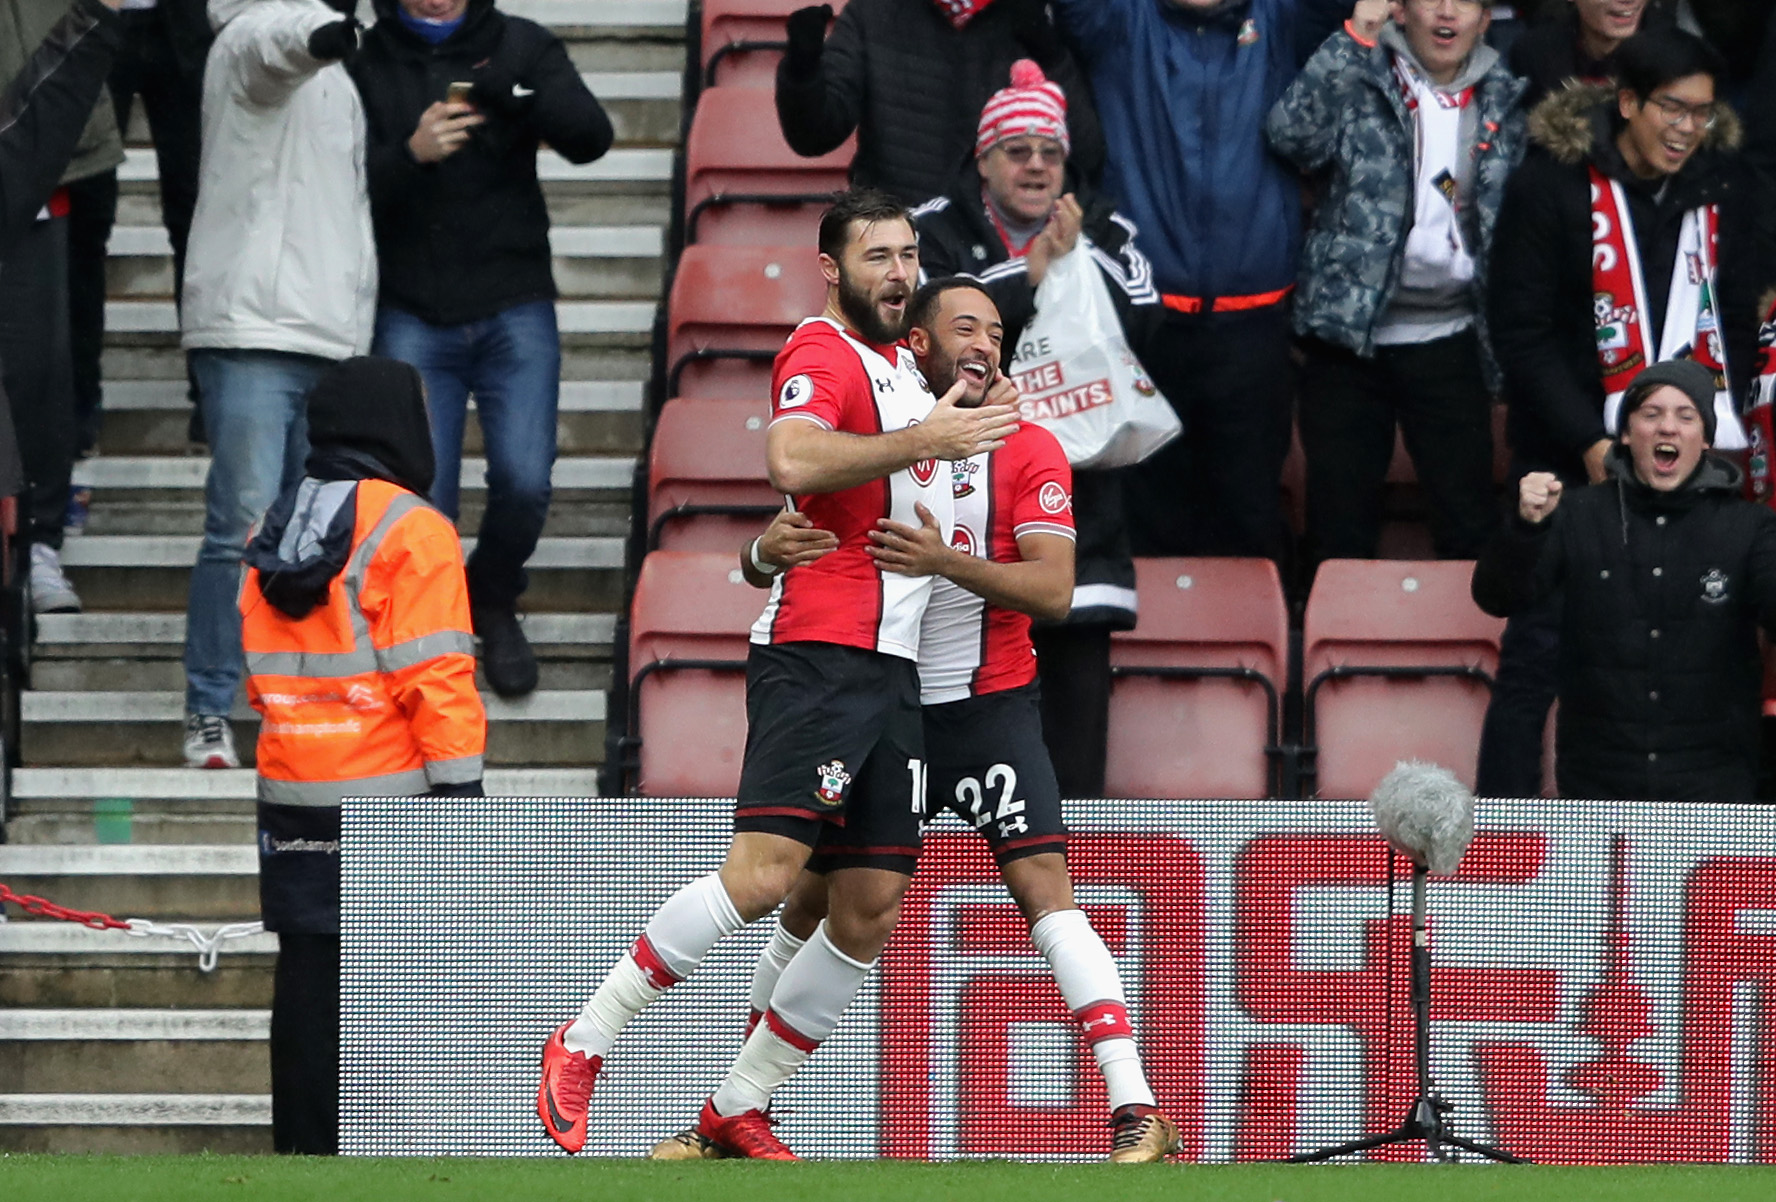 Southampton vs Arsenal: Player Ratings Following 1-1 Draw